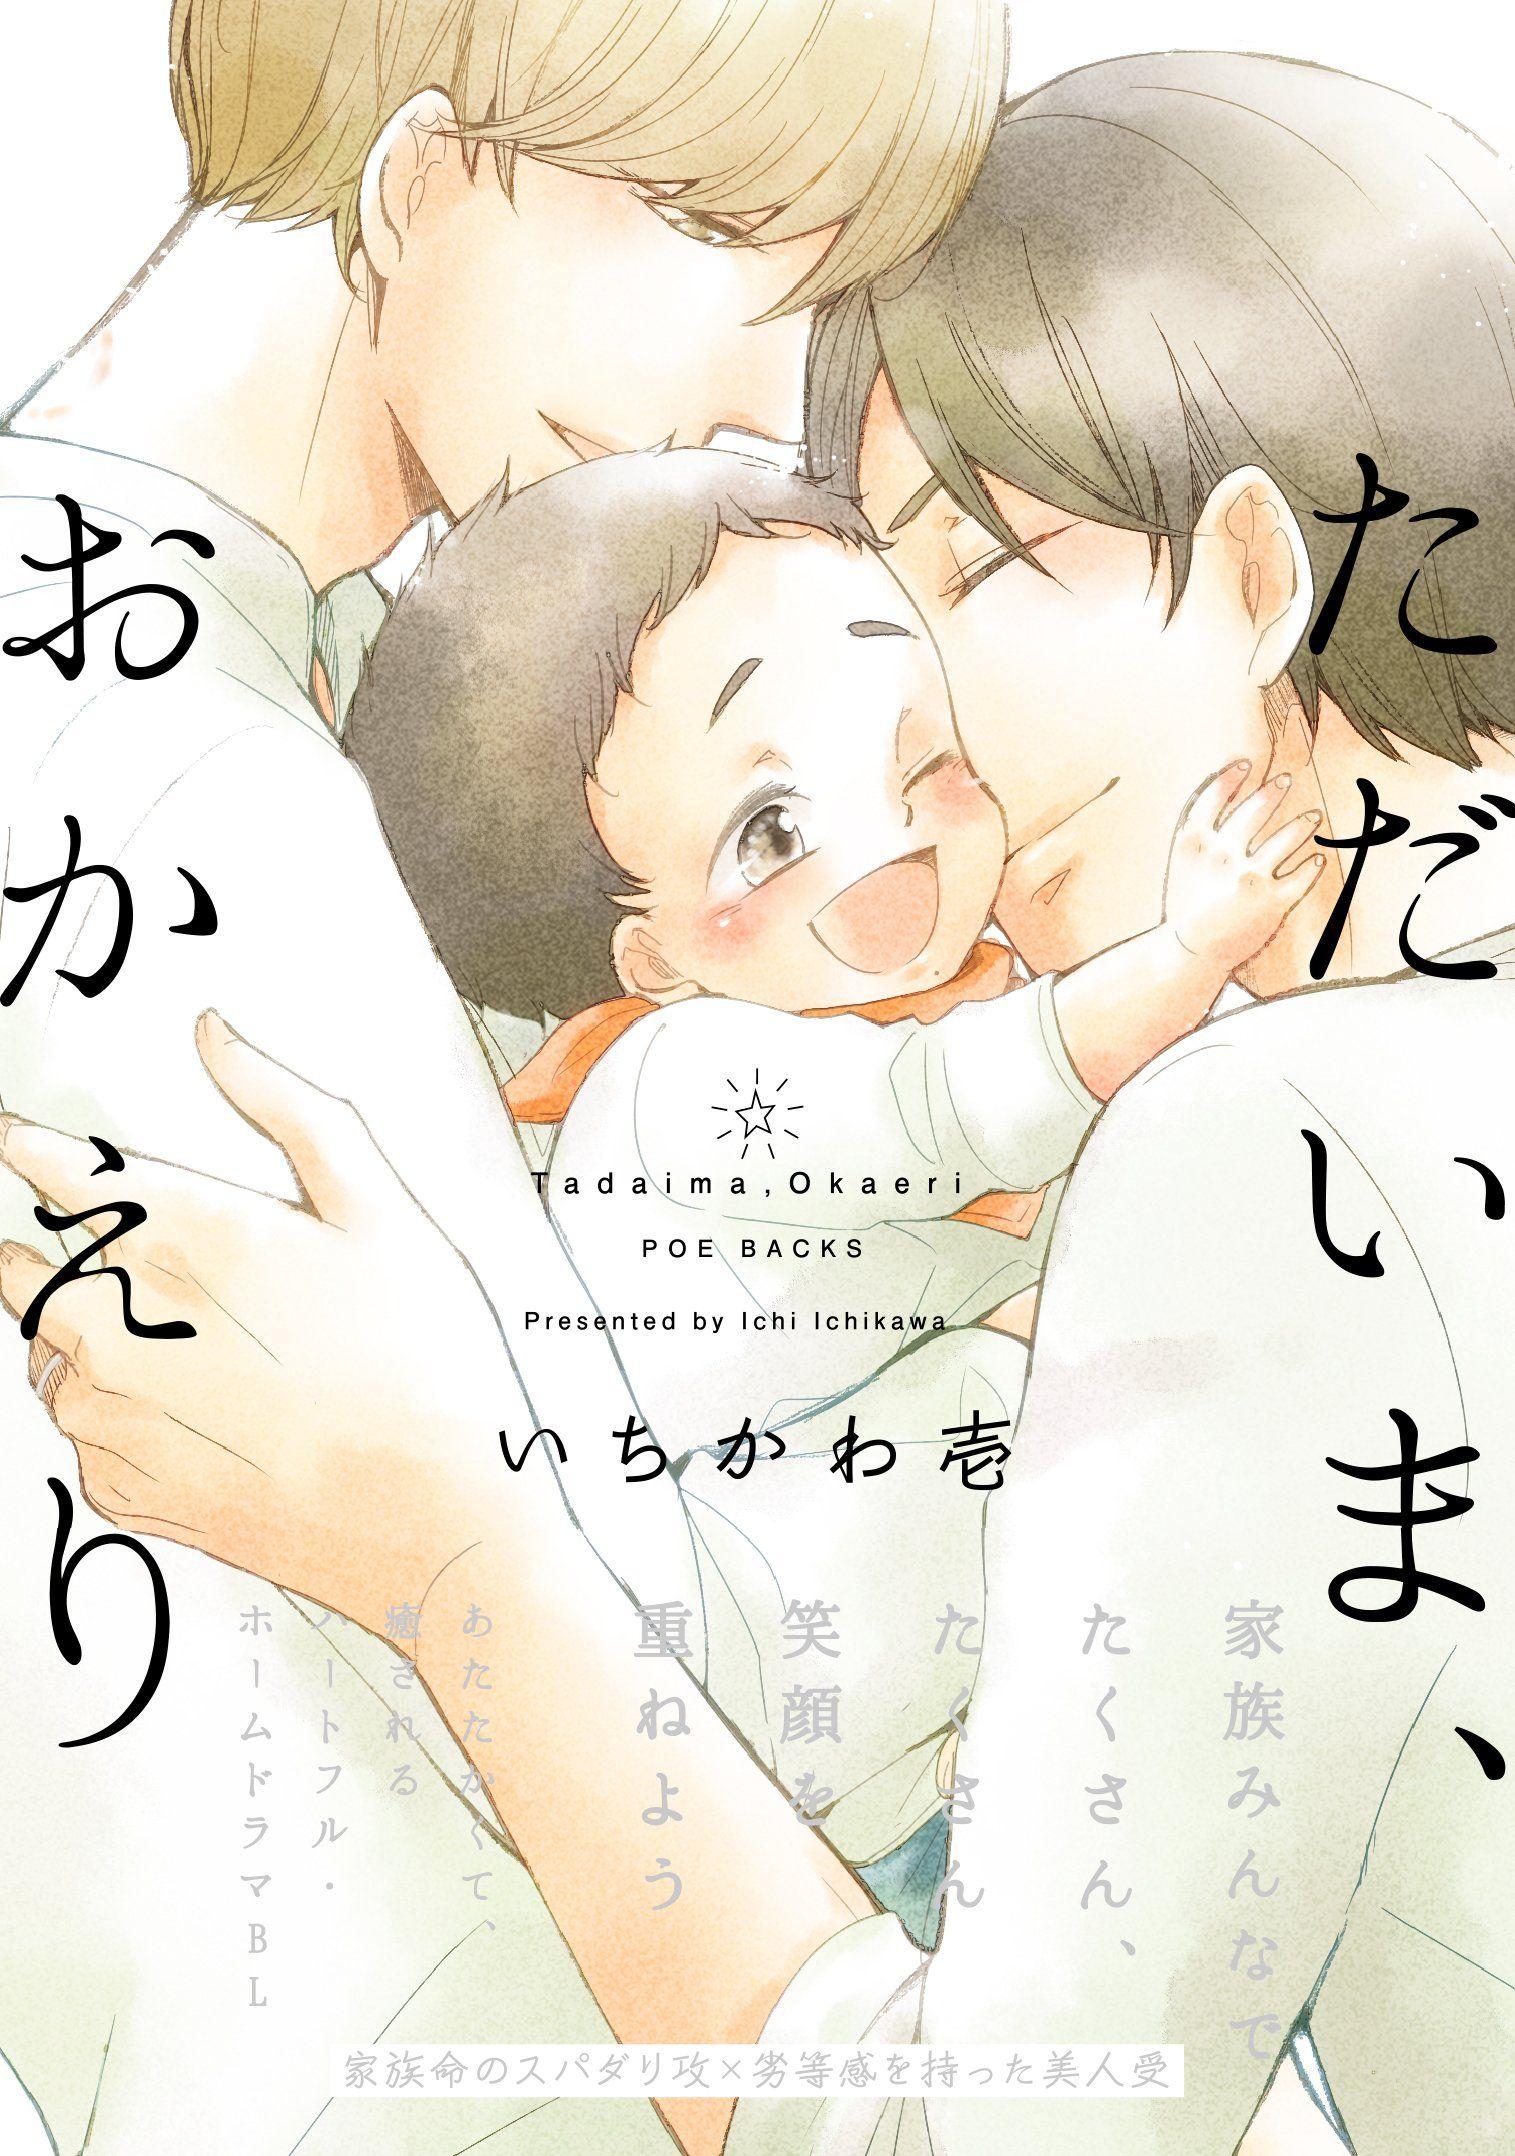 [PLANNING DES SORTIES MANGA] 28 Juin 2017 - 04 Juillet 2017   Tadaima-okaeri-jp-0